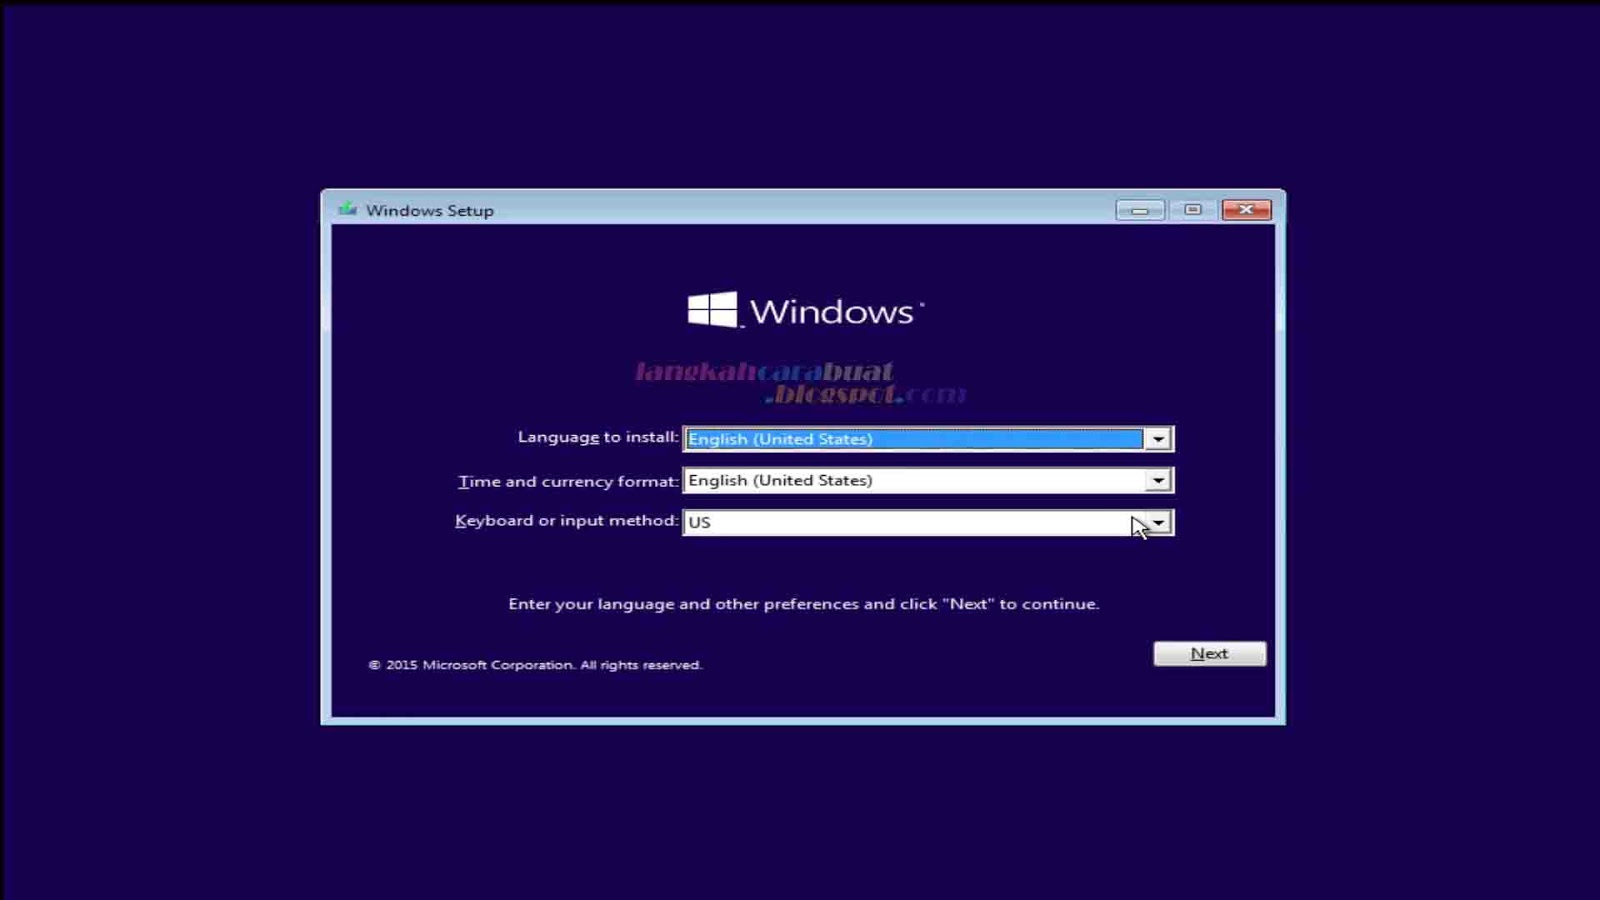 Cara Instal Ulang Komputer / Laptop Menggunakan OS Windows 10 Terbaru ...